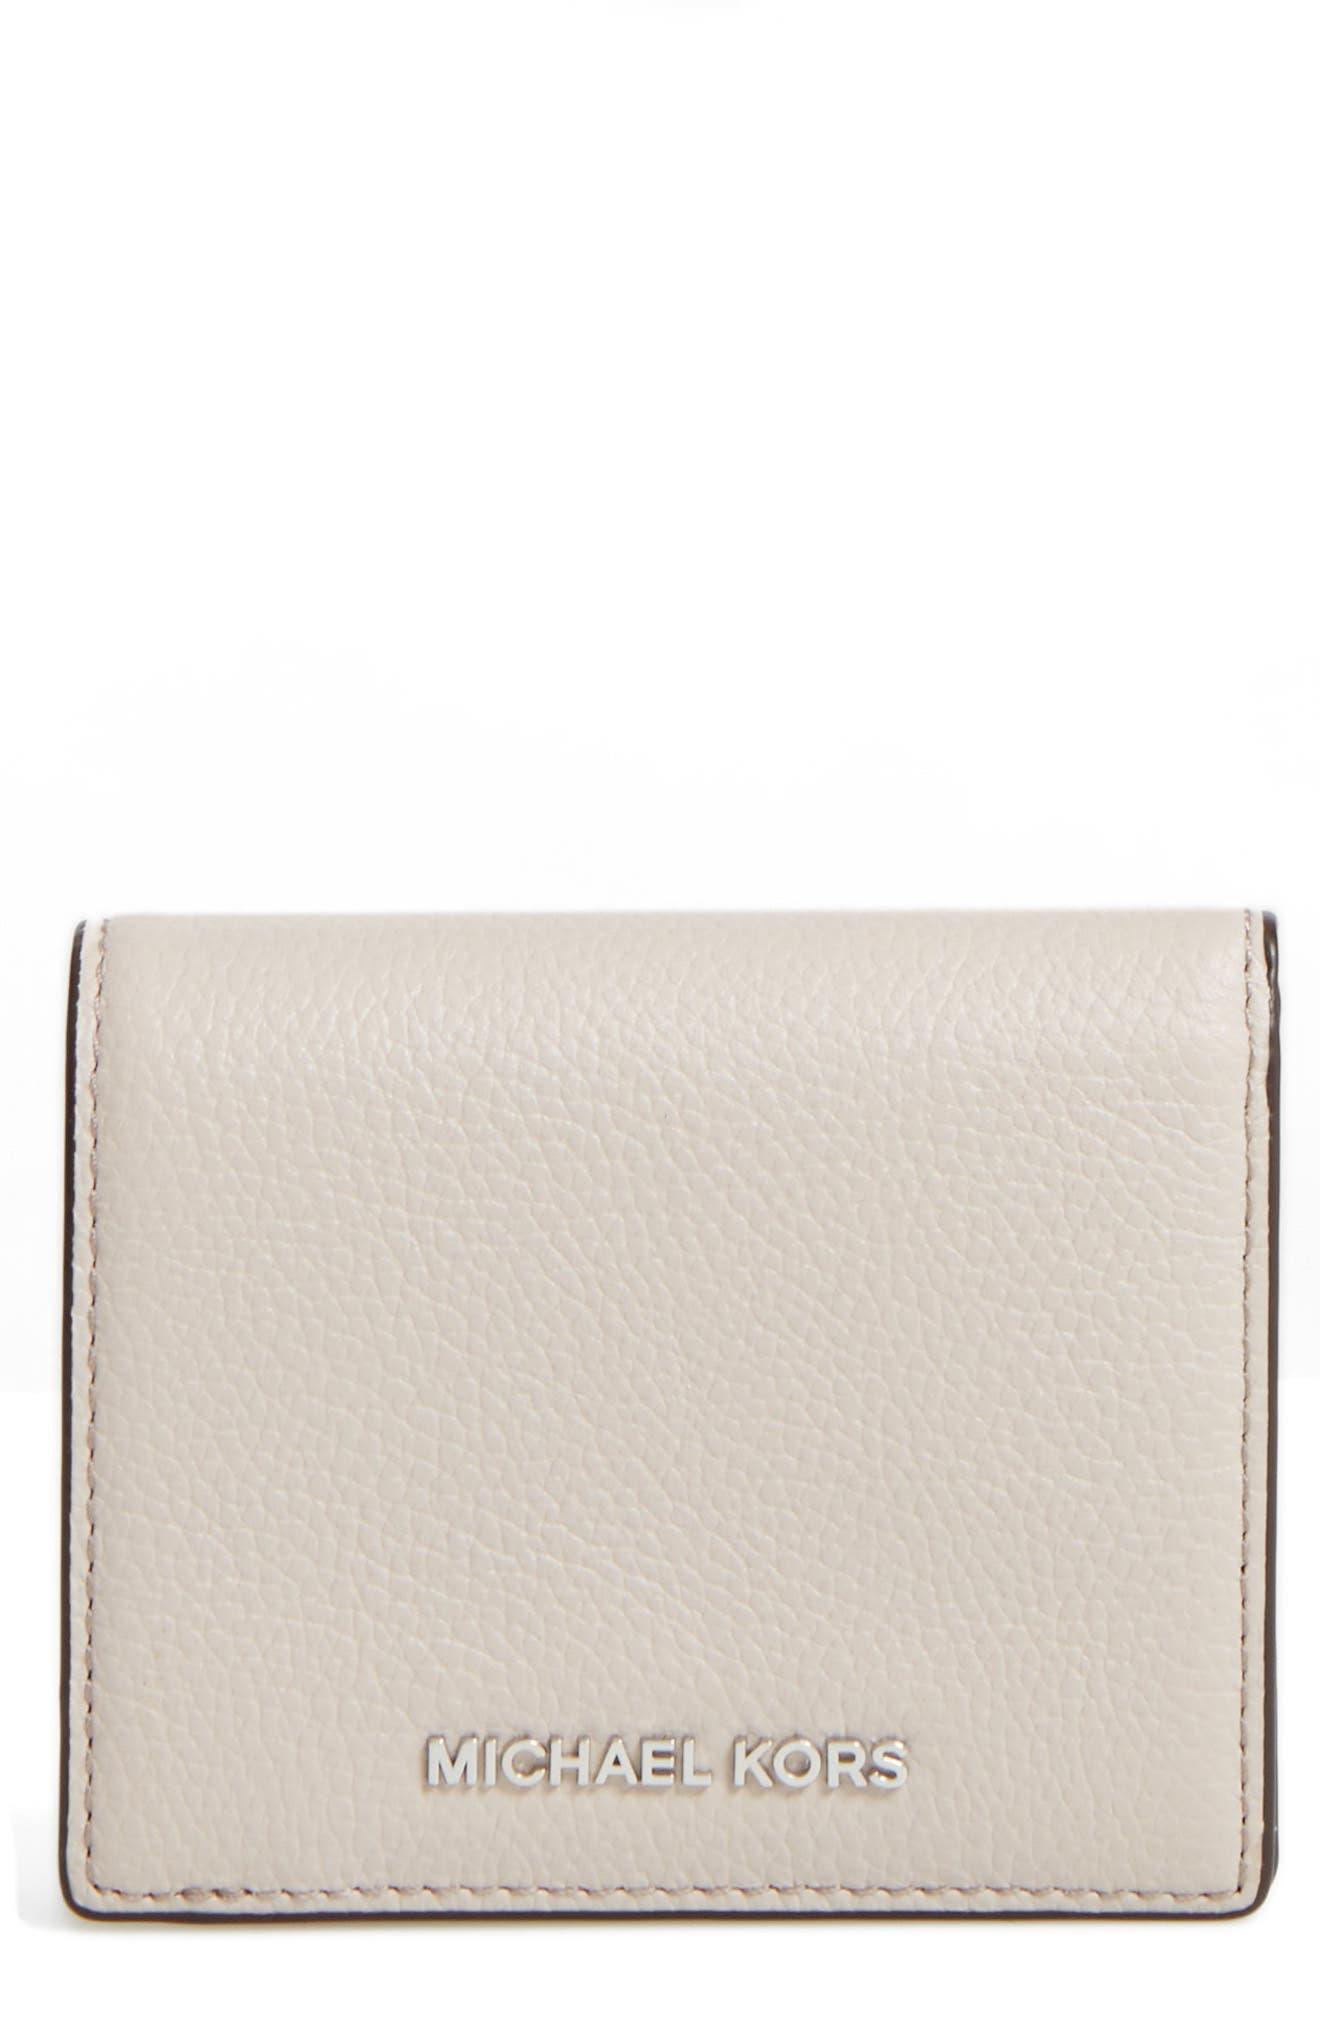 MICHAEL Michael Kors Mercer Leather RFID Cardholder Wallet